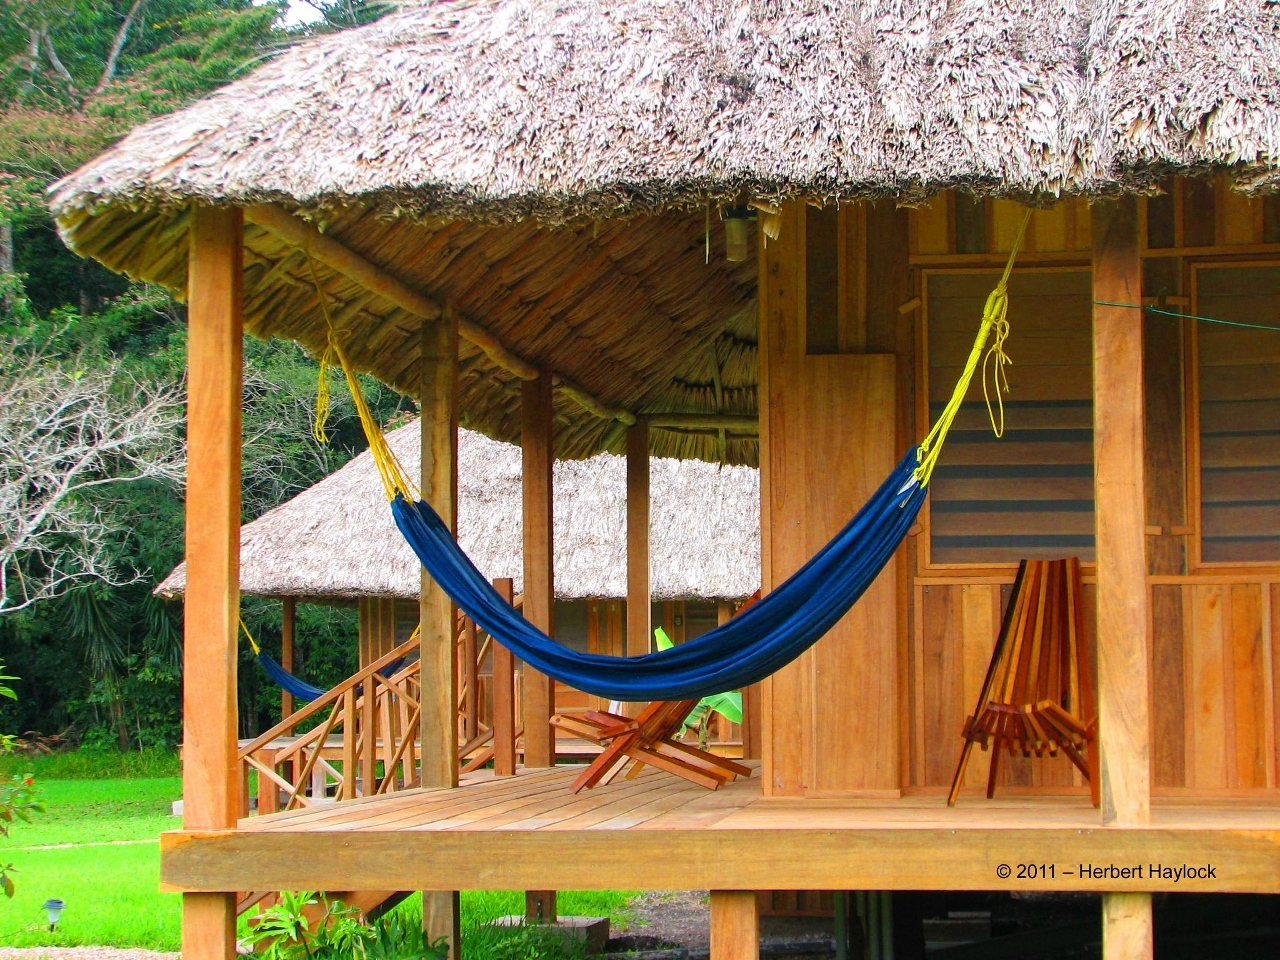 La Milpa - Program for Belize - Belize Jungle Lodges - All Inclusive Vacation Packages to Belize - SabreWing Travel